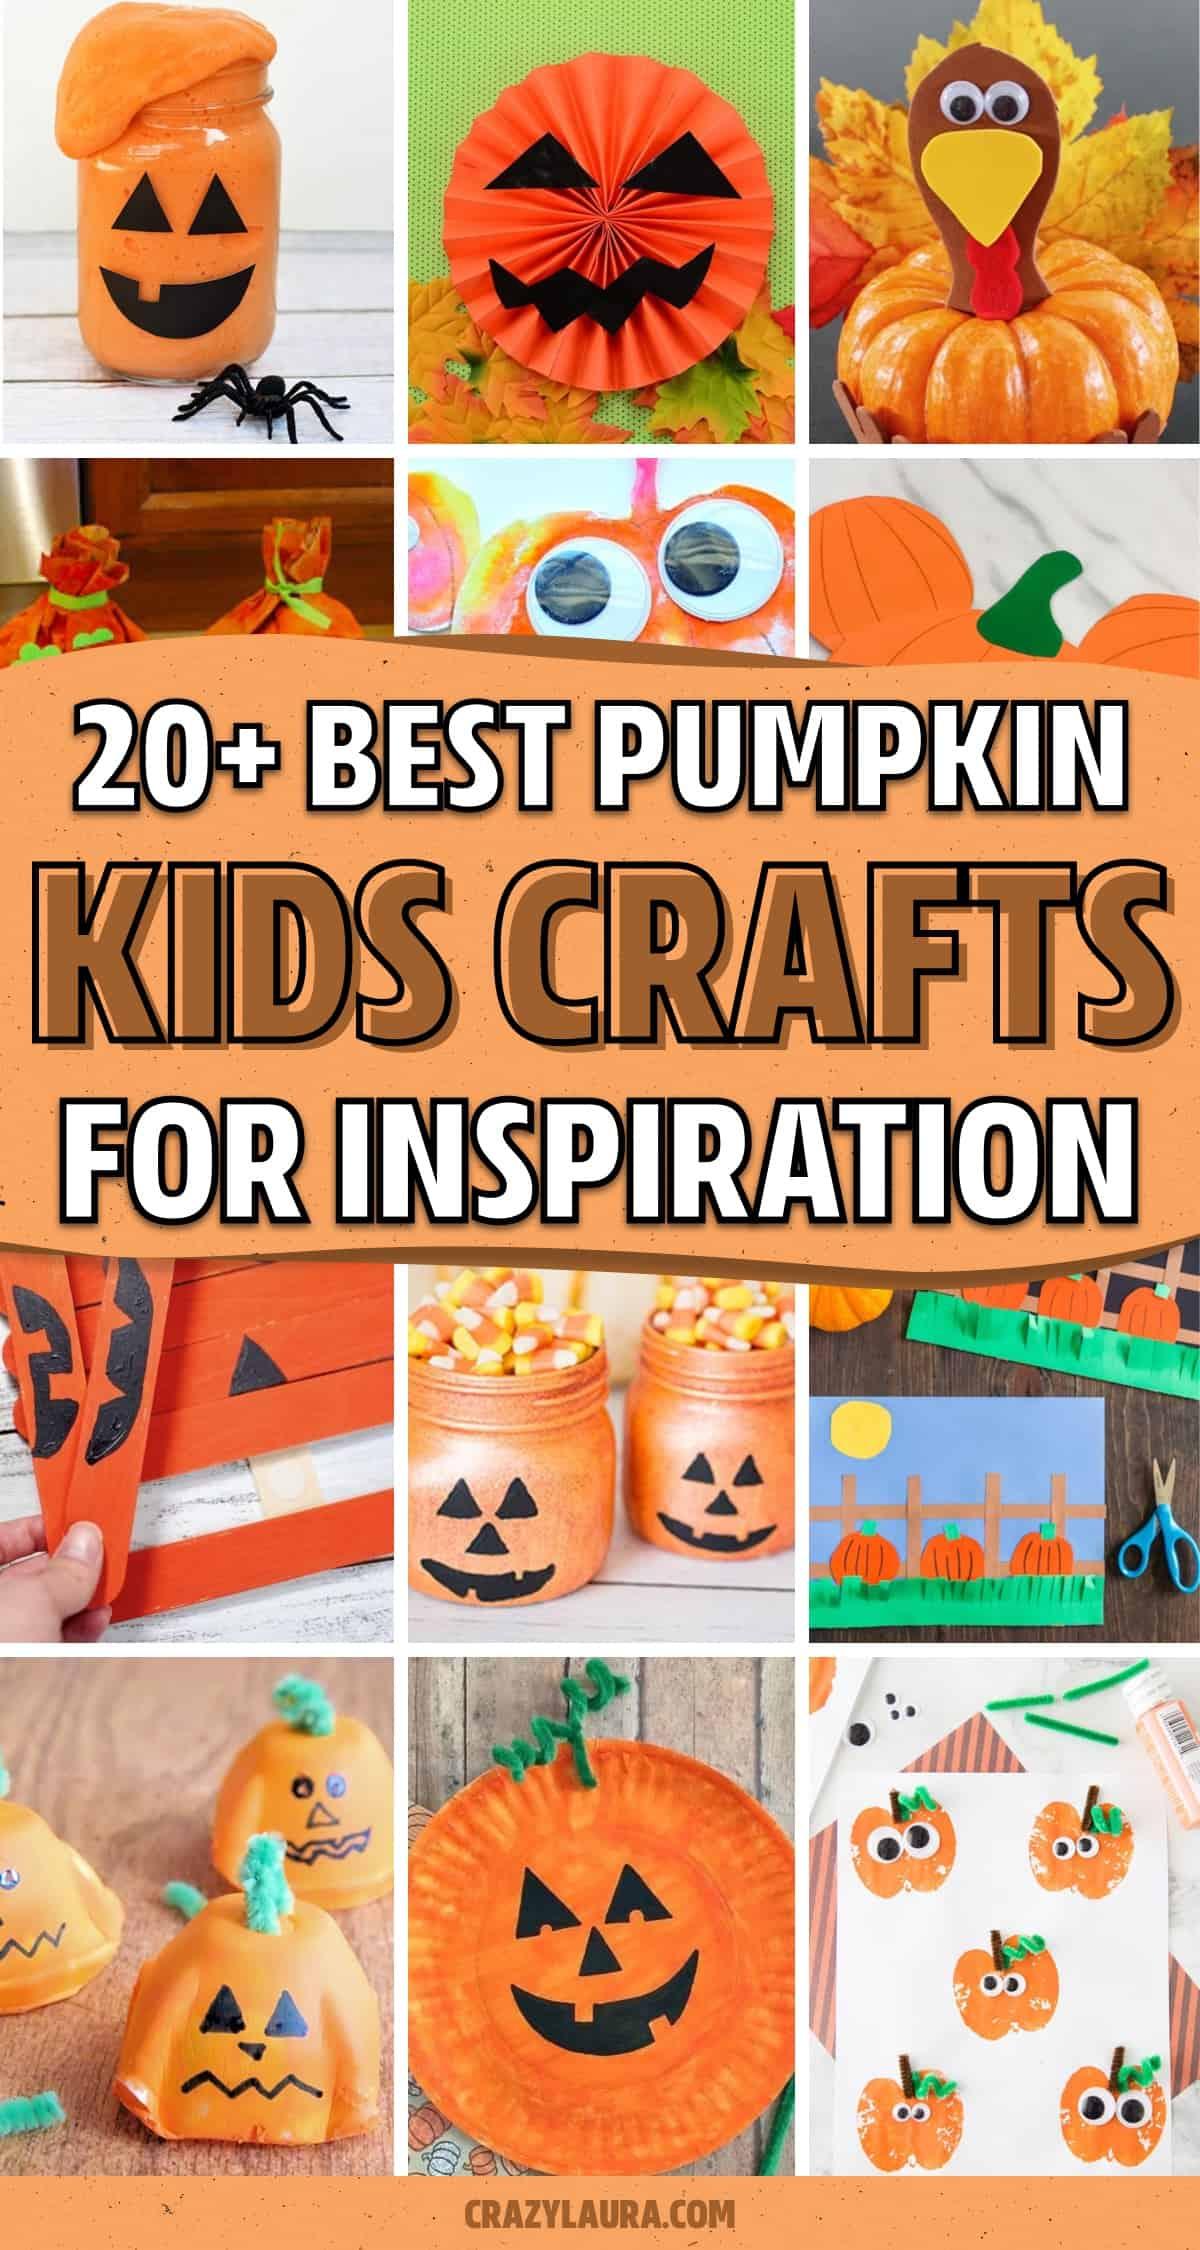 craft activity tutorials with pumpkin shapes